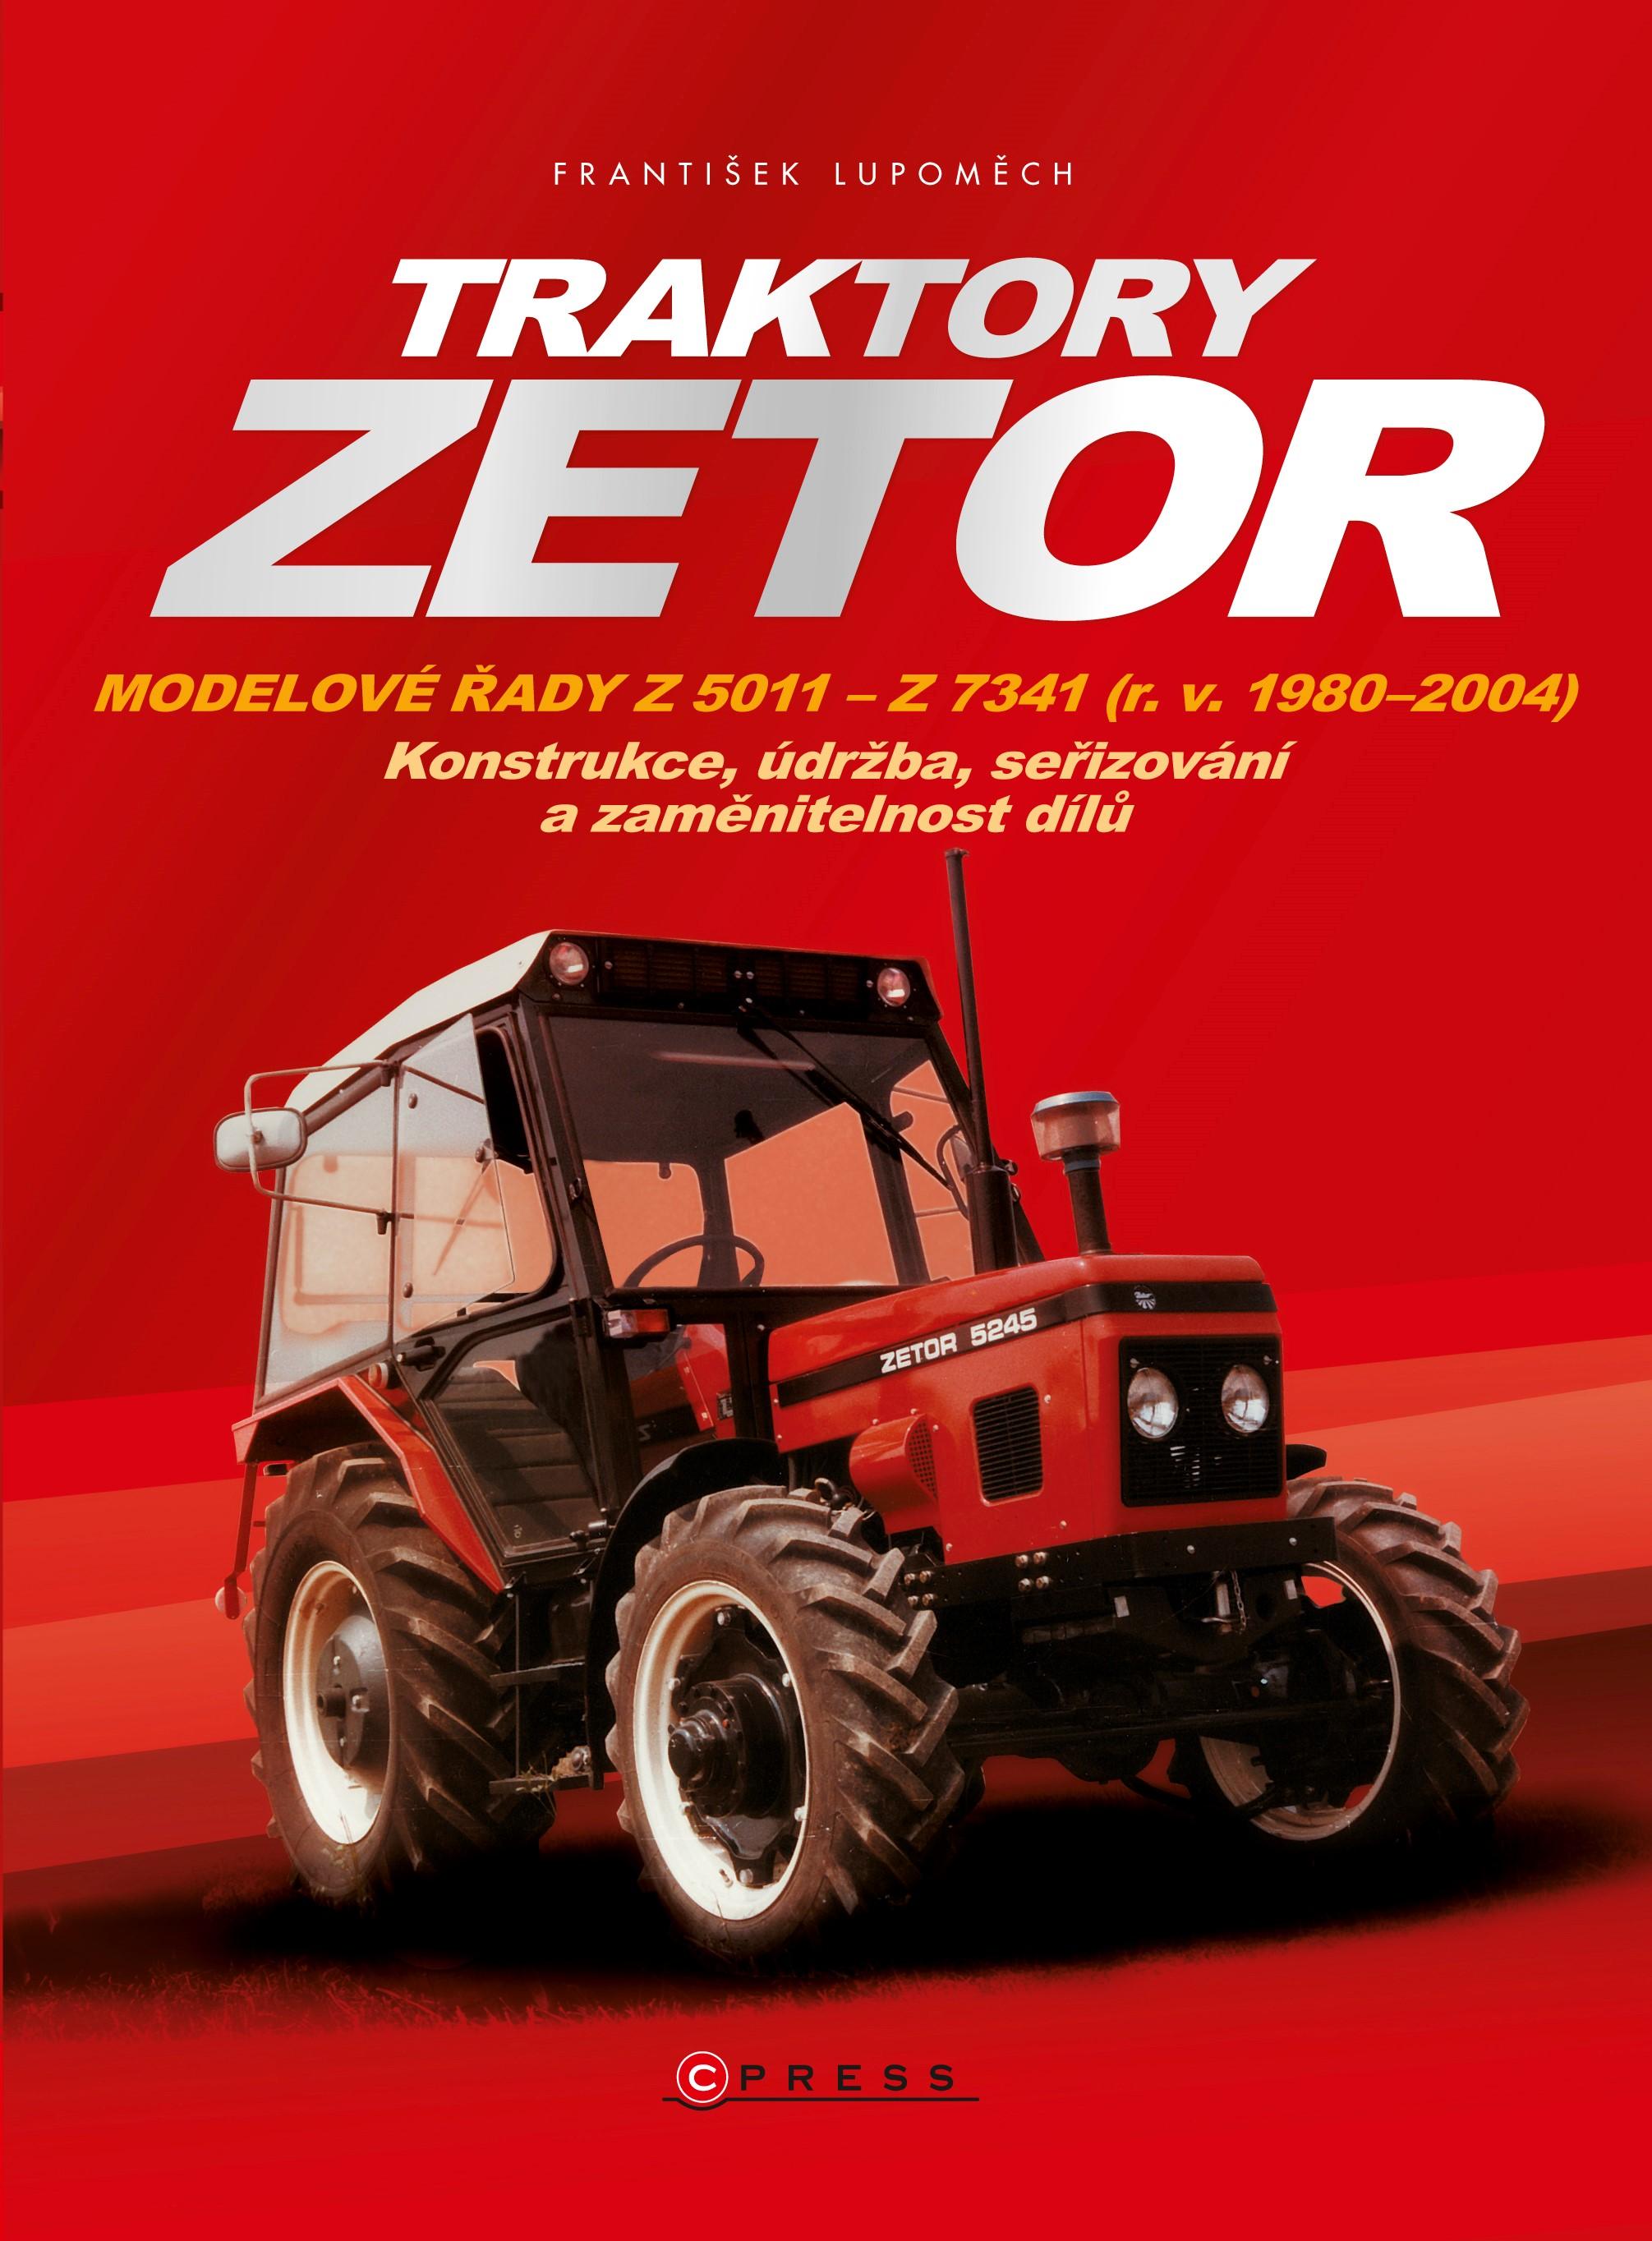 Traktory Zetor | František Lupoměch